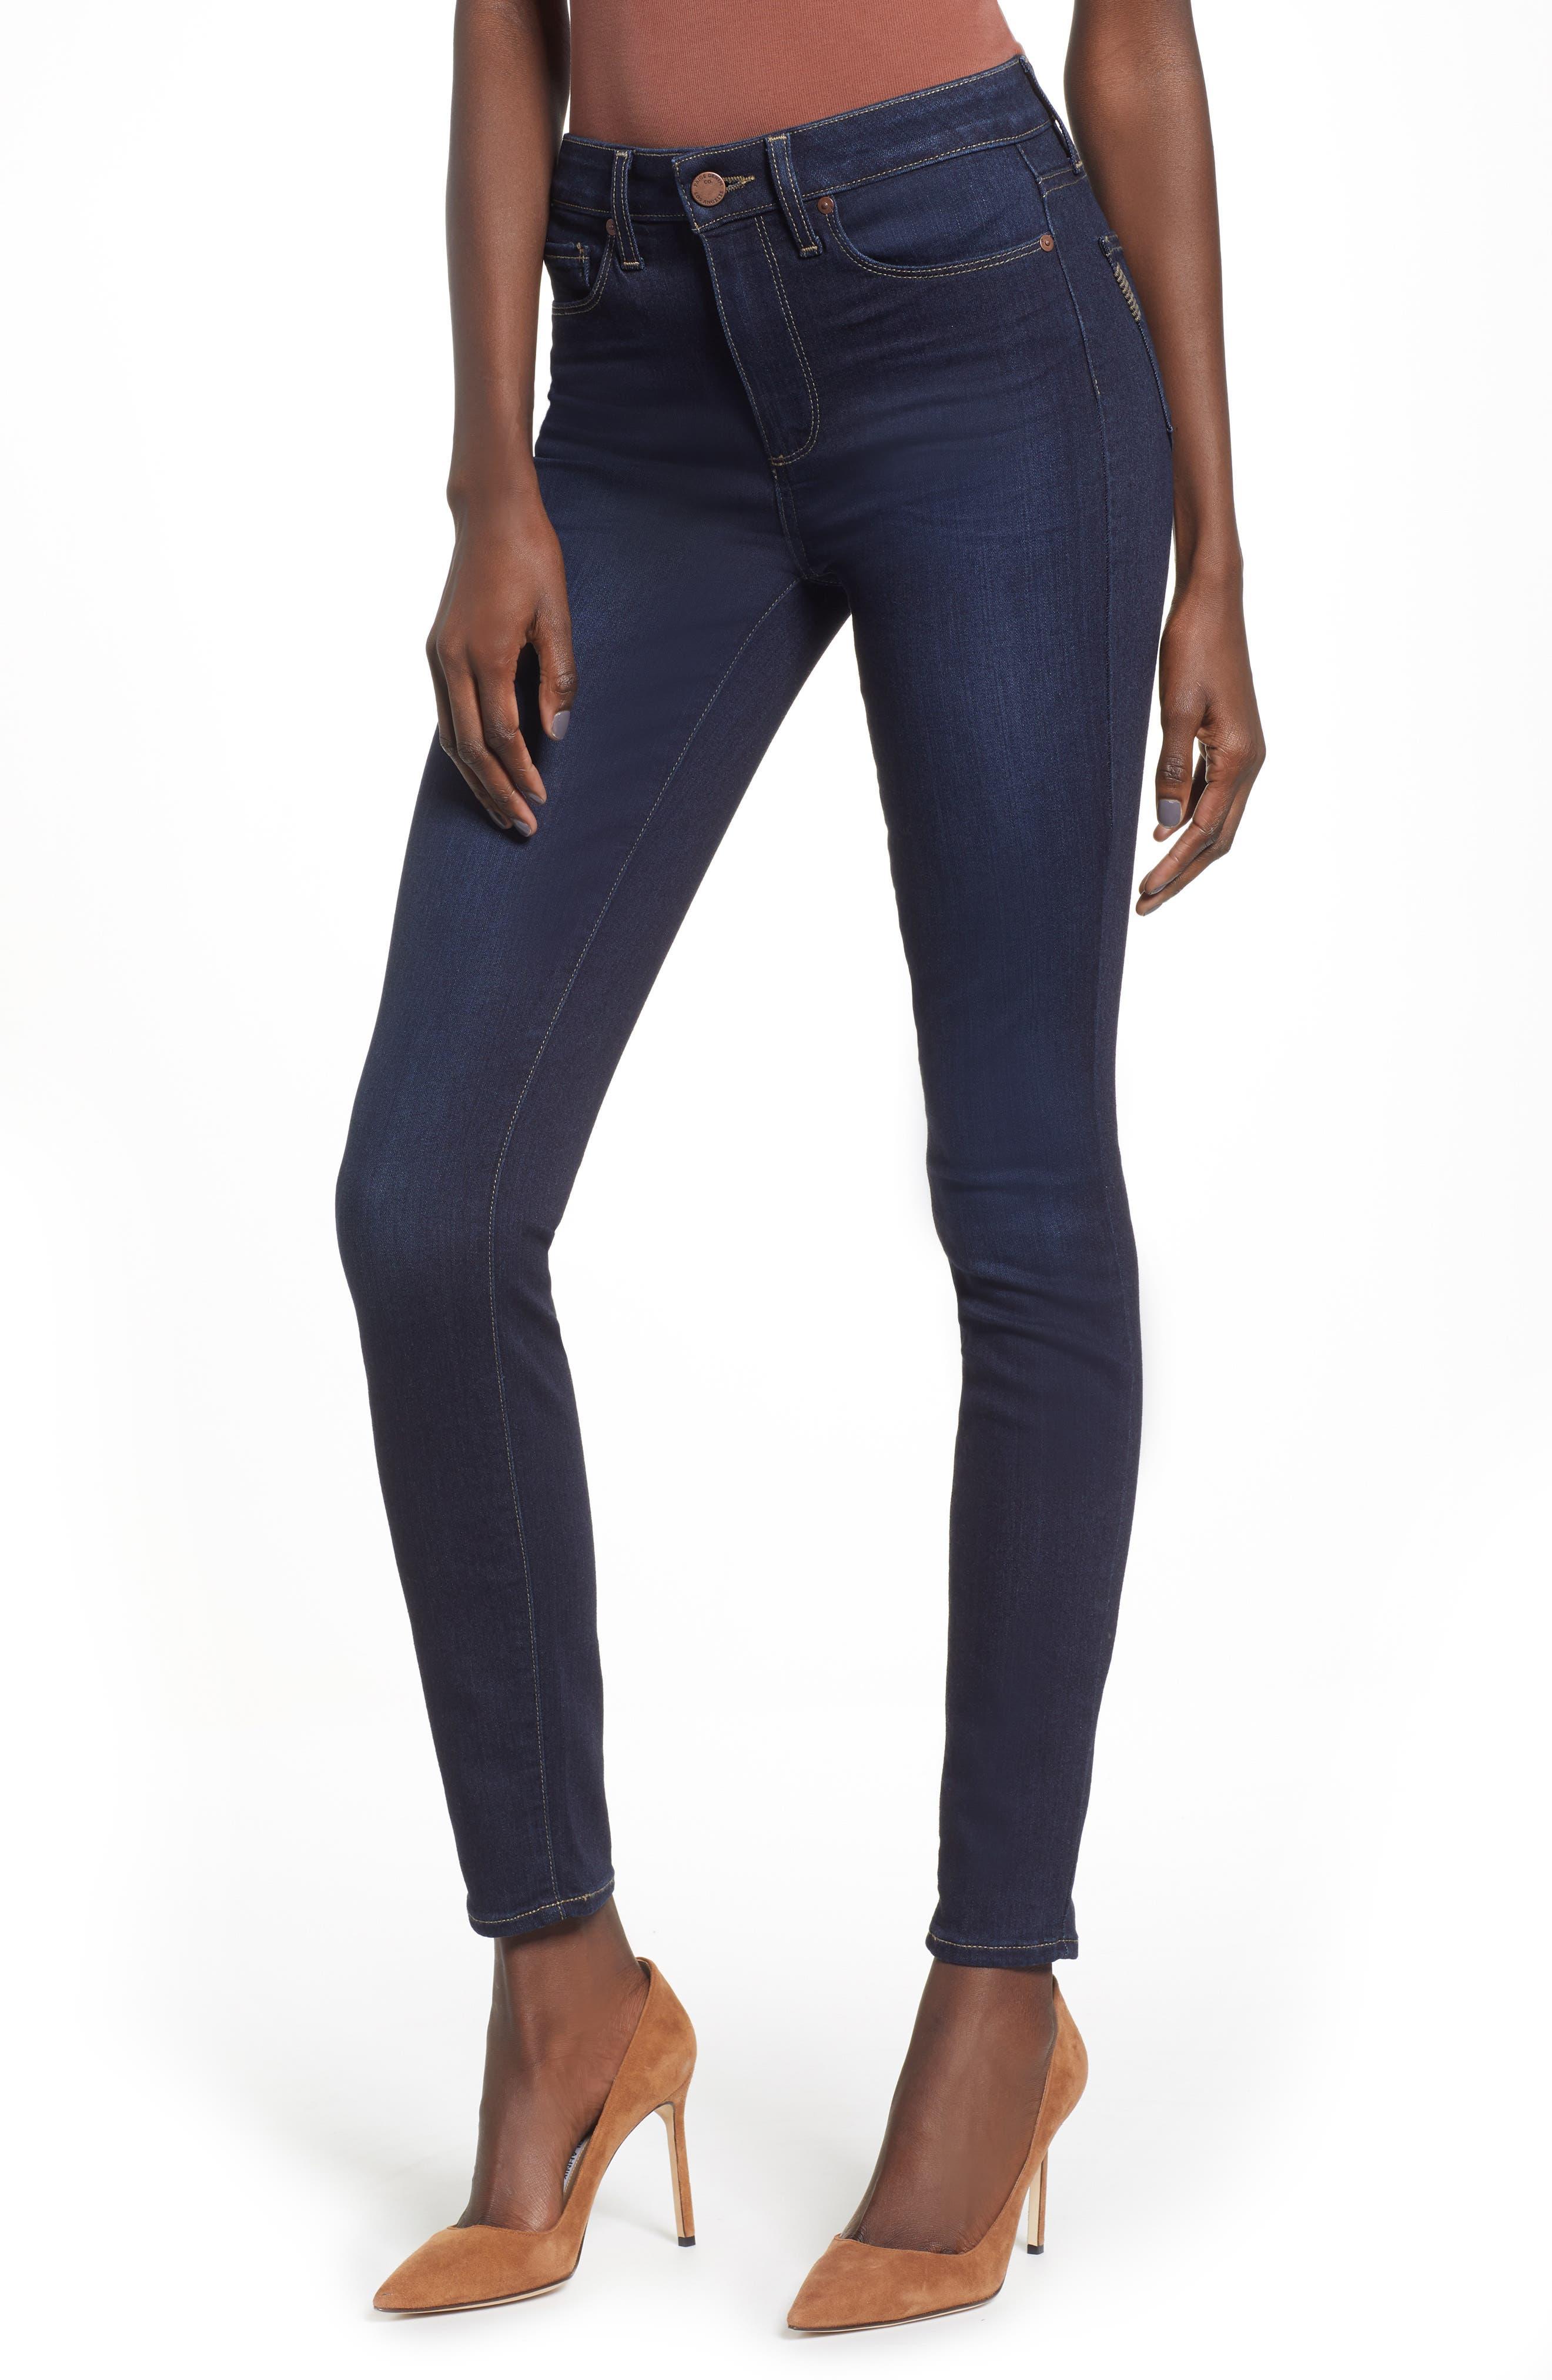 Transcend - Hoxton High Waist Ultra Skinny Jeans,                             Main thumbnail 1, color,                             SANIA